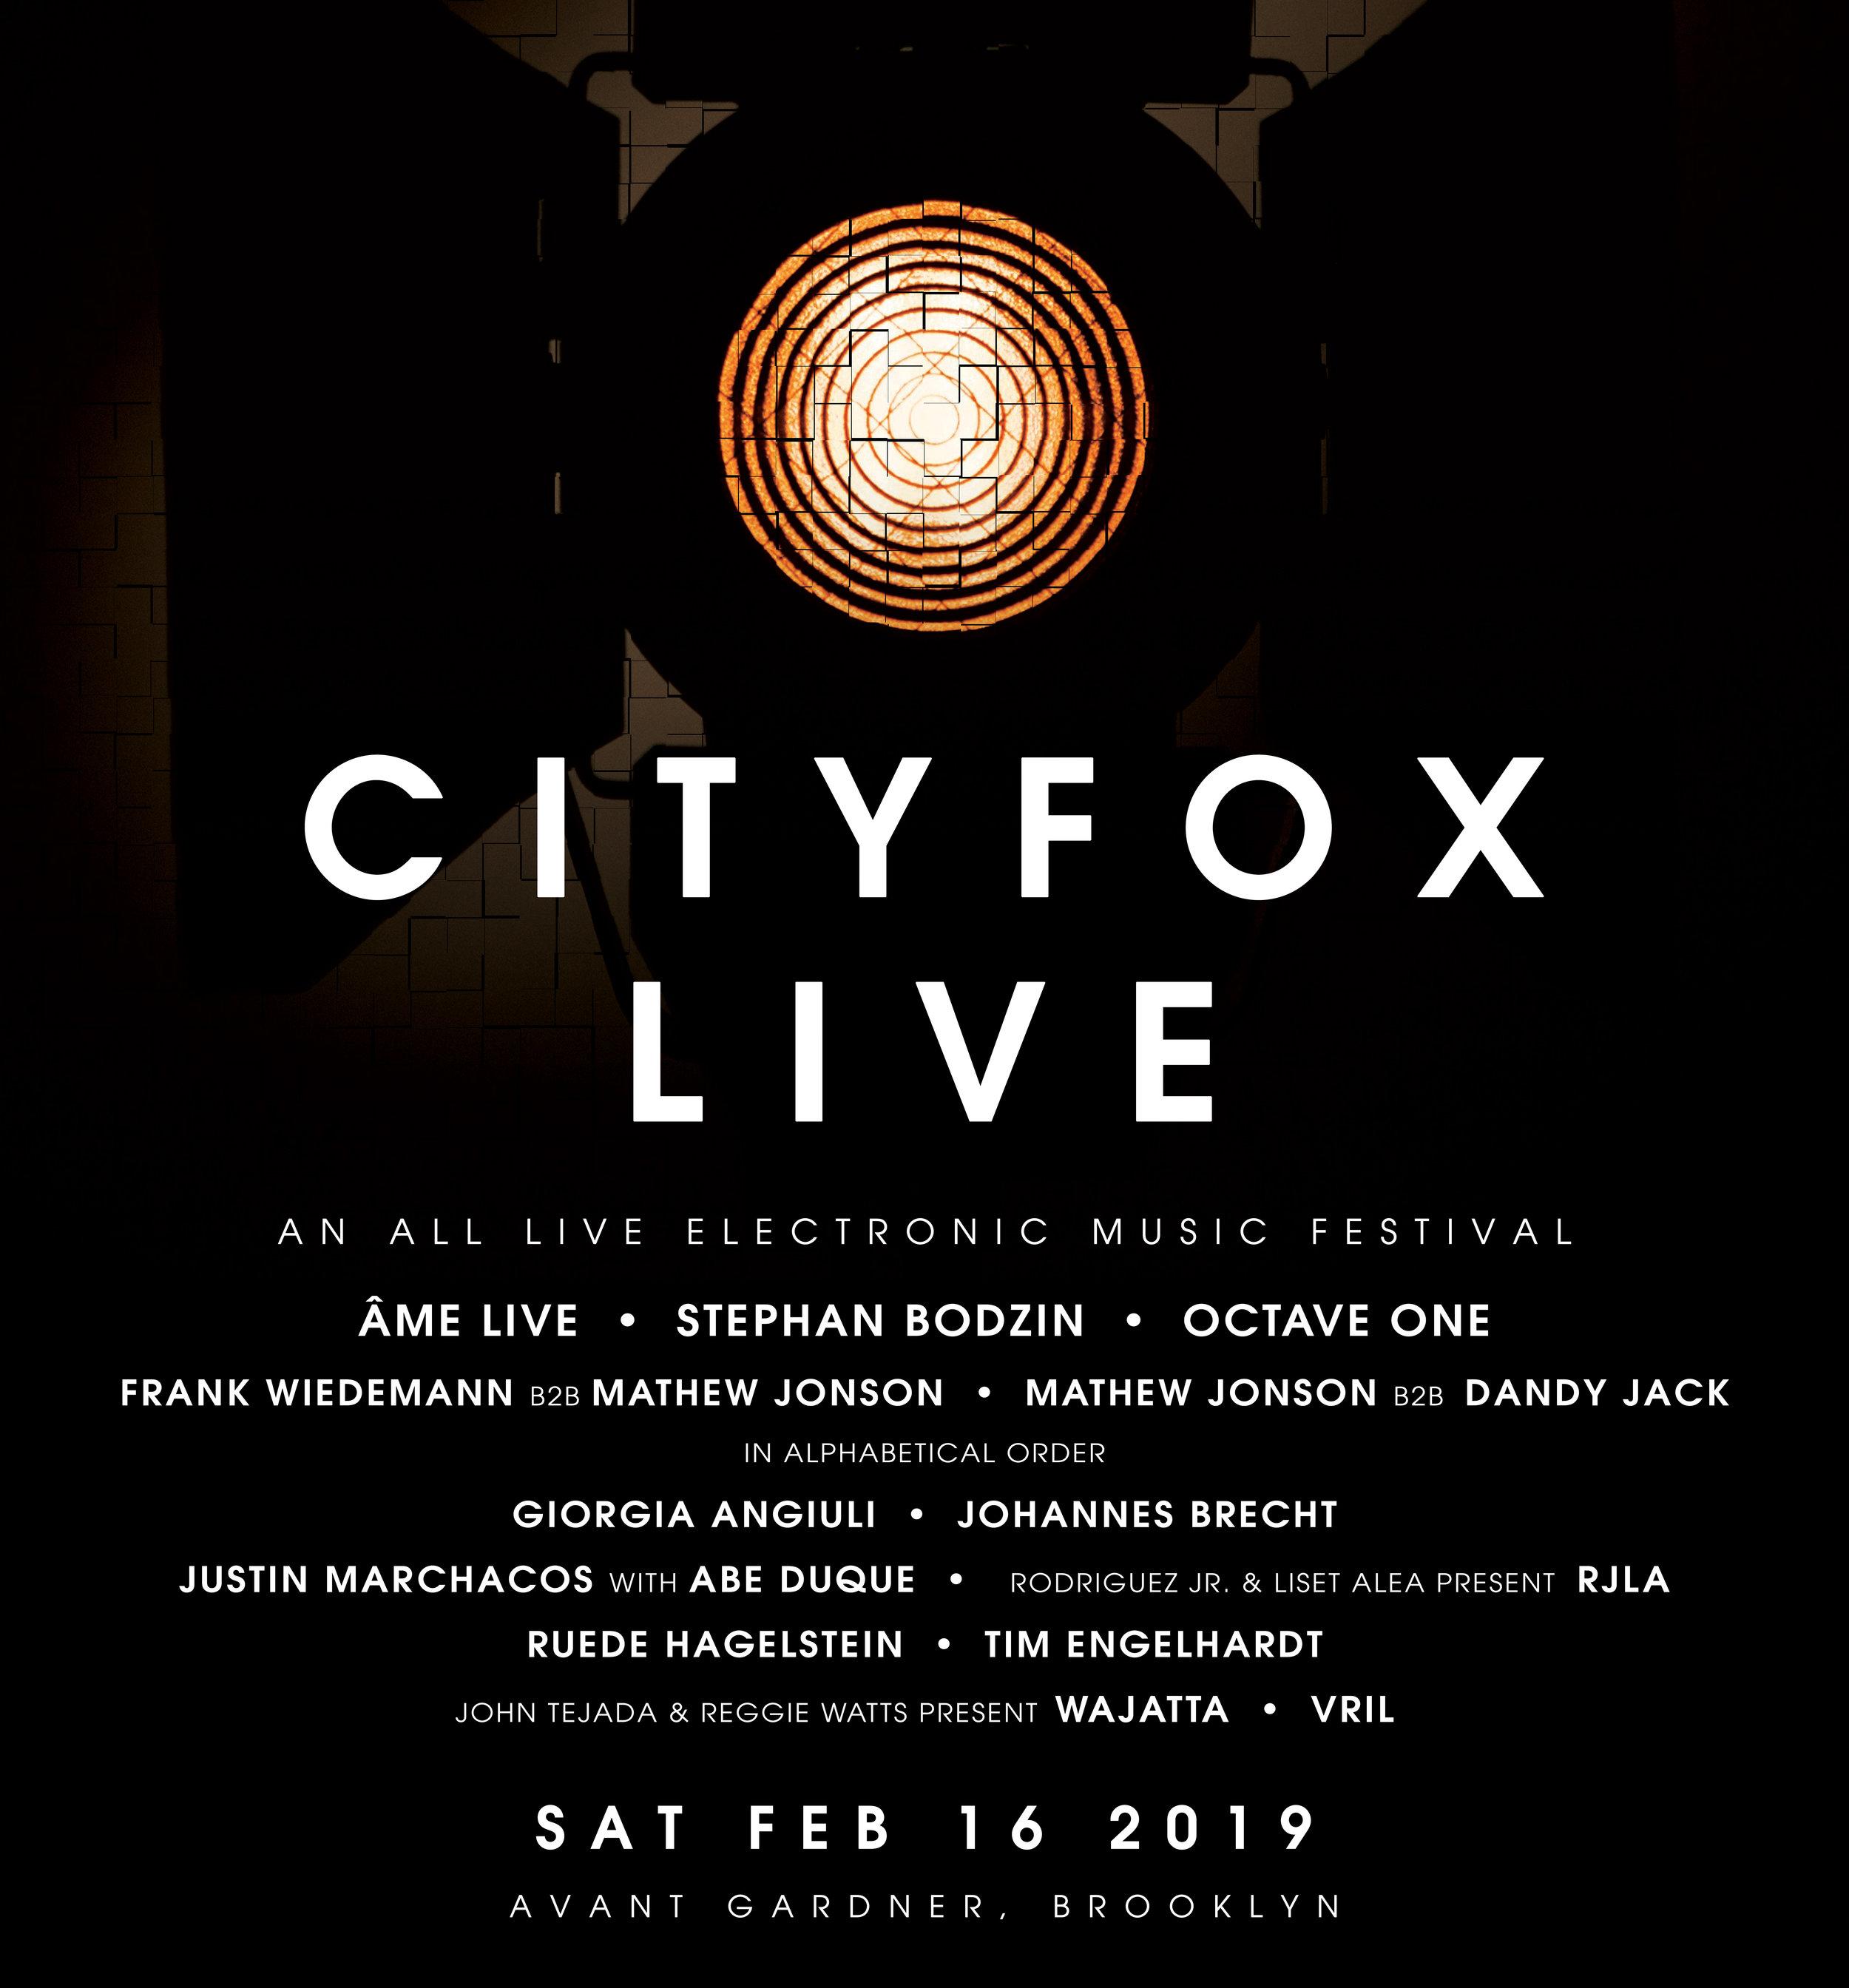 cityfoxlive-lineup-square.jpg